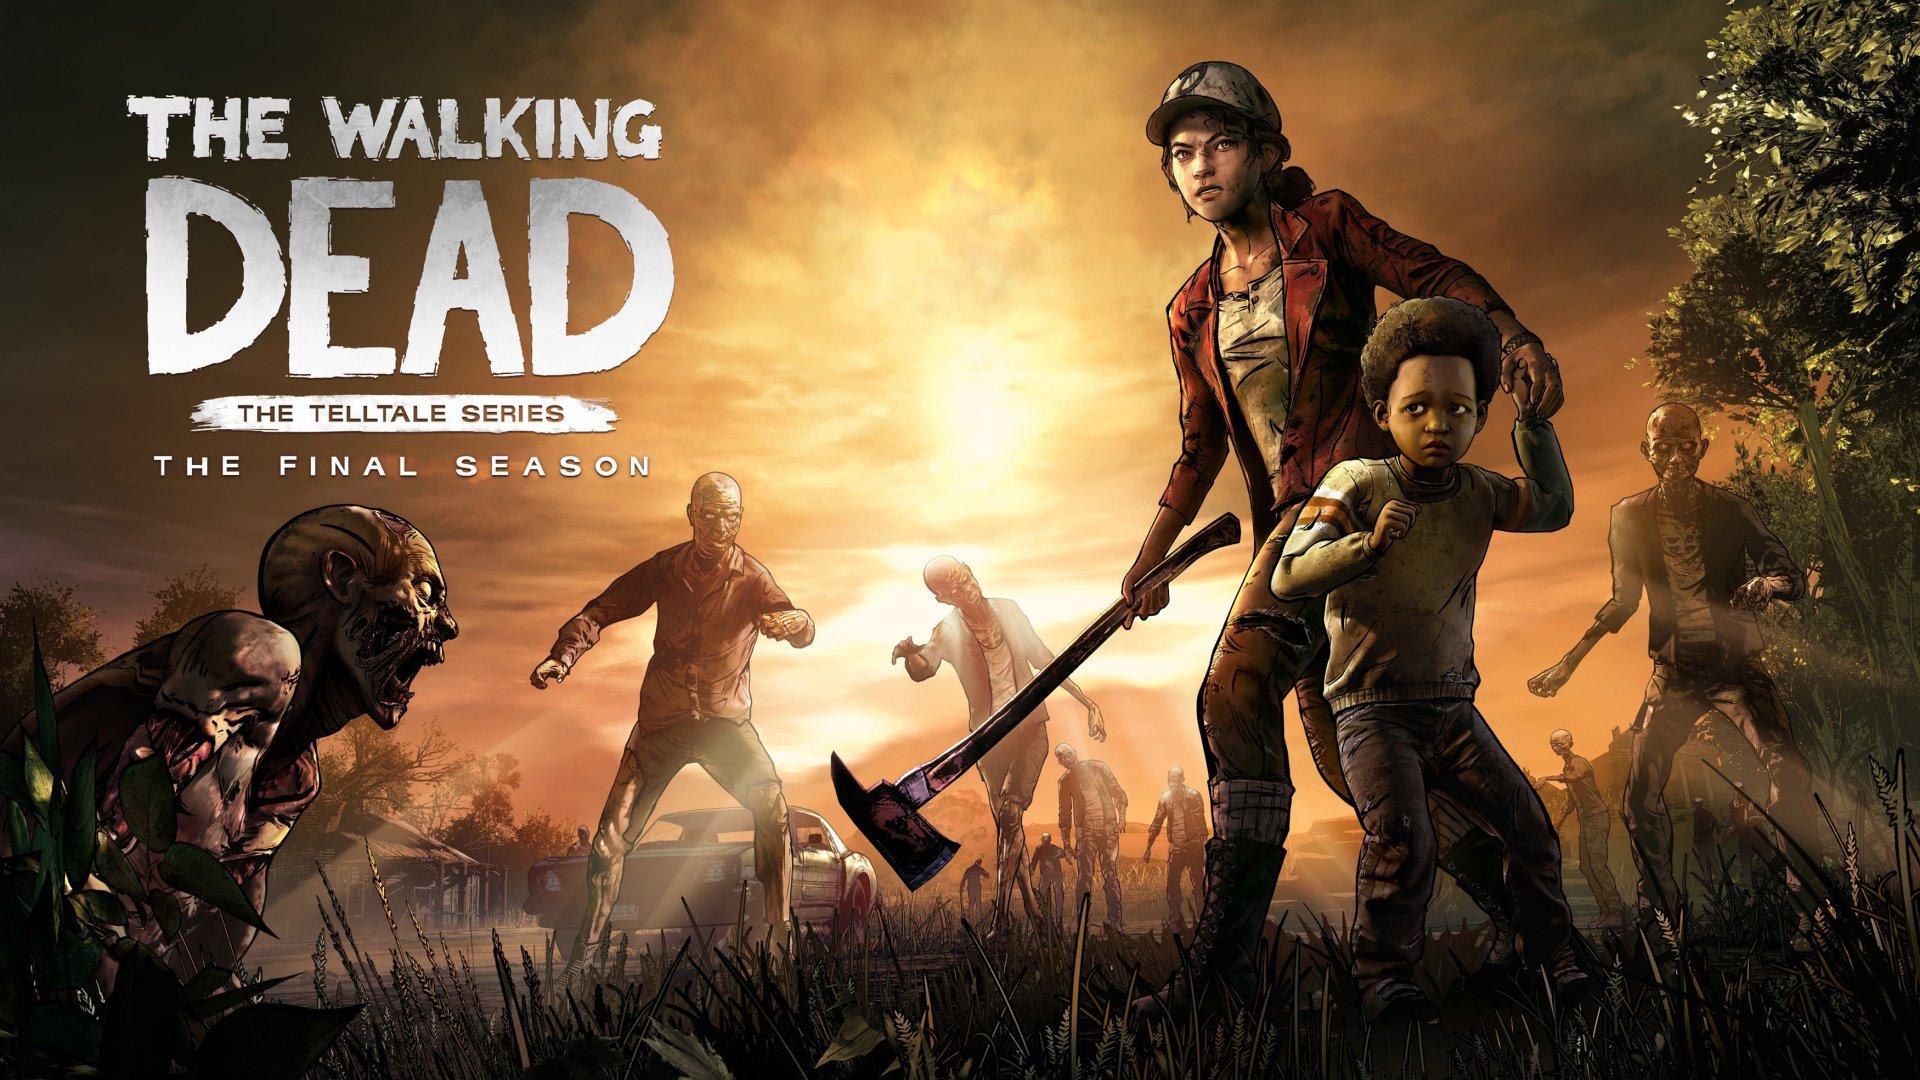 42 The Walking Dead The Final Season HD Wallpapers Background 1920x1080